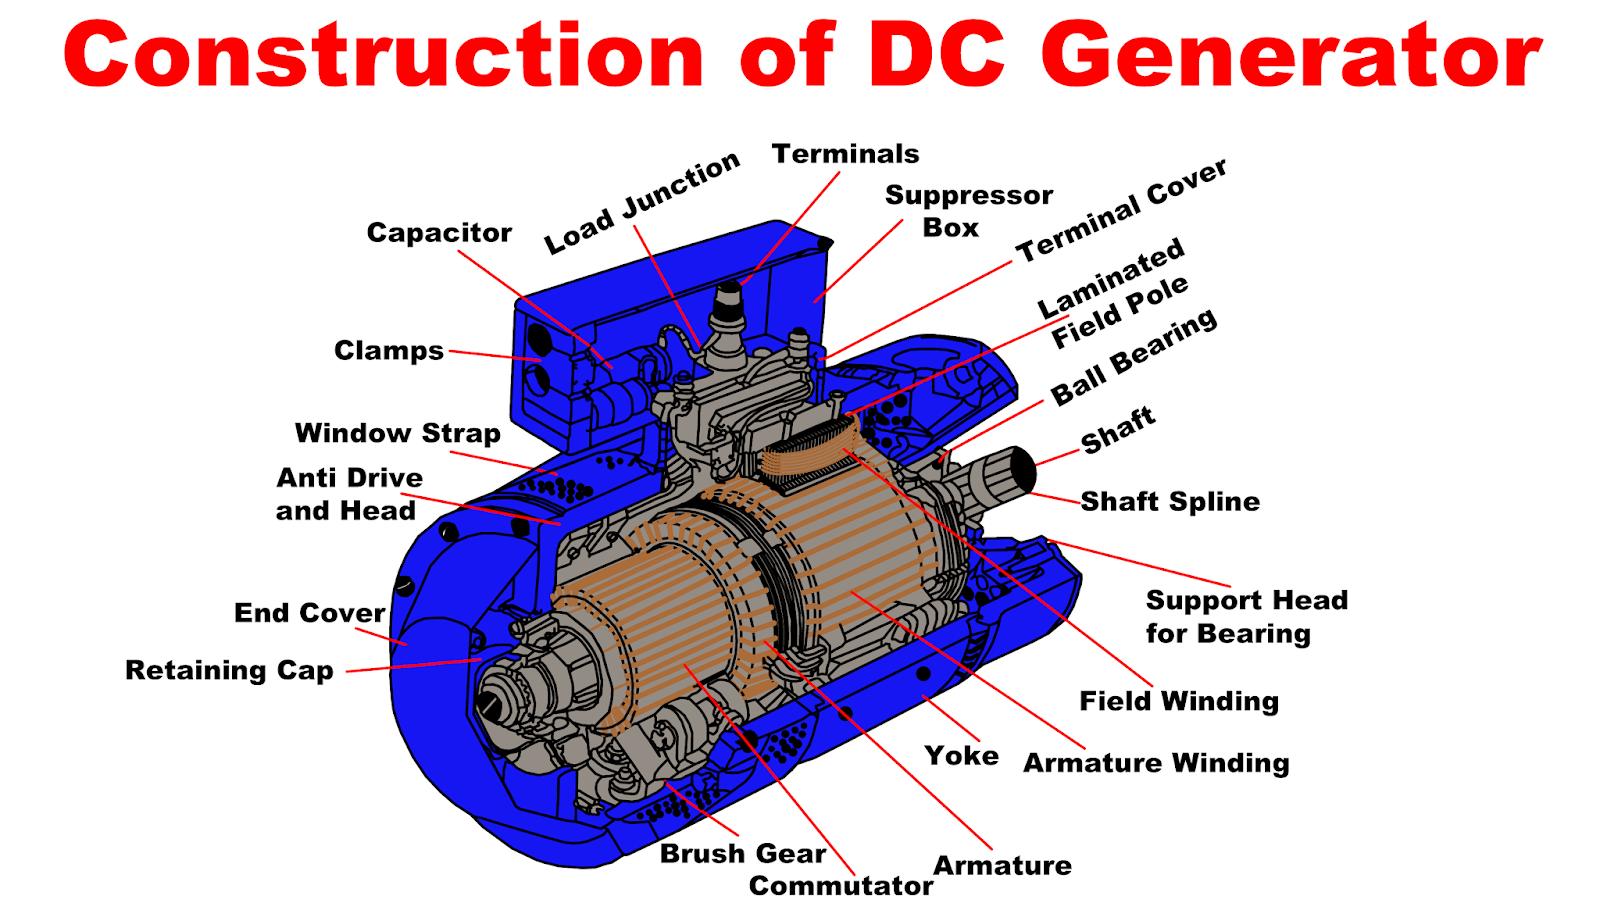 Dc Generator Working Principle Construction Parts Of Dc Generator Types Of Dc Generator Working Of Dc Generator Emf Equation Of Dc Generator Losses In Dc